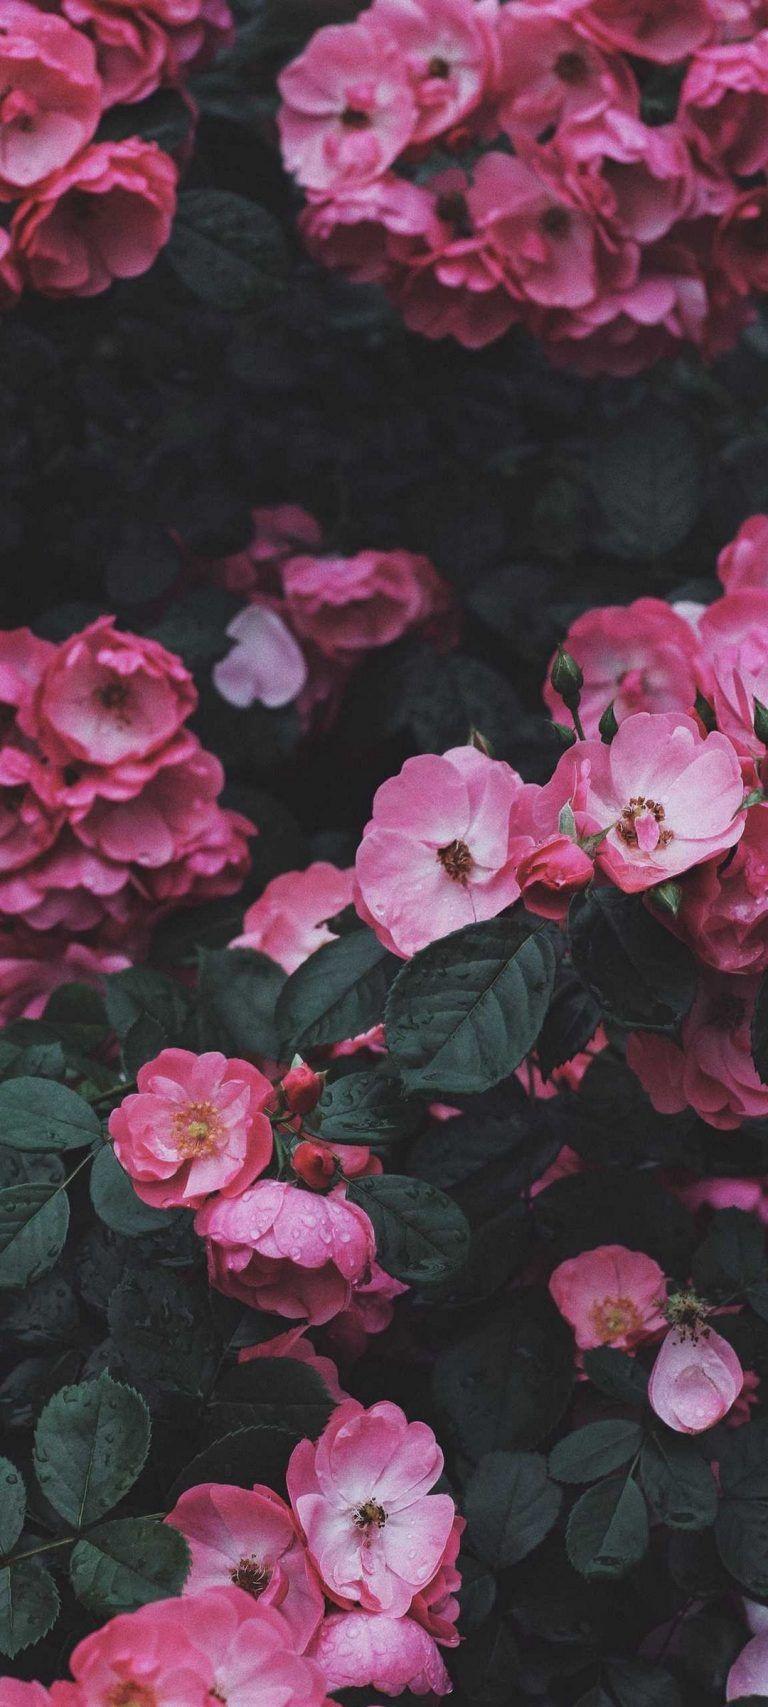 Wild Rose Rose Bush – [1080×2400] 4K